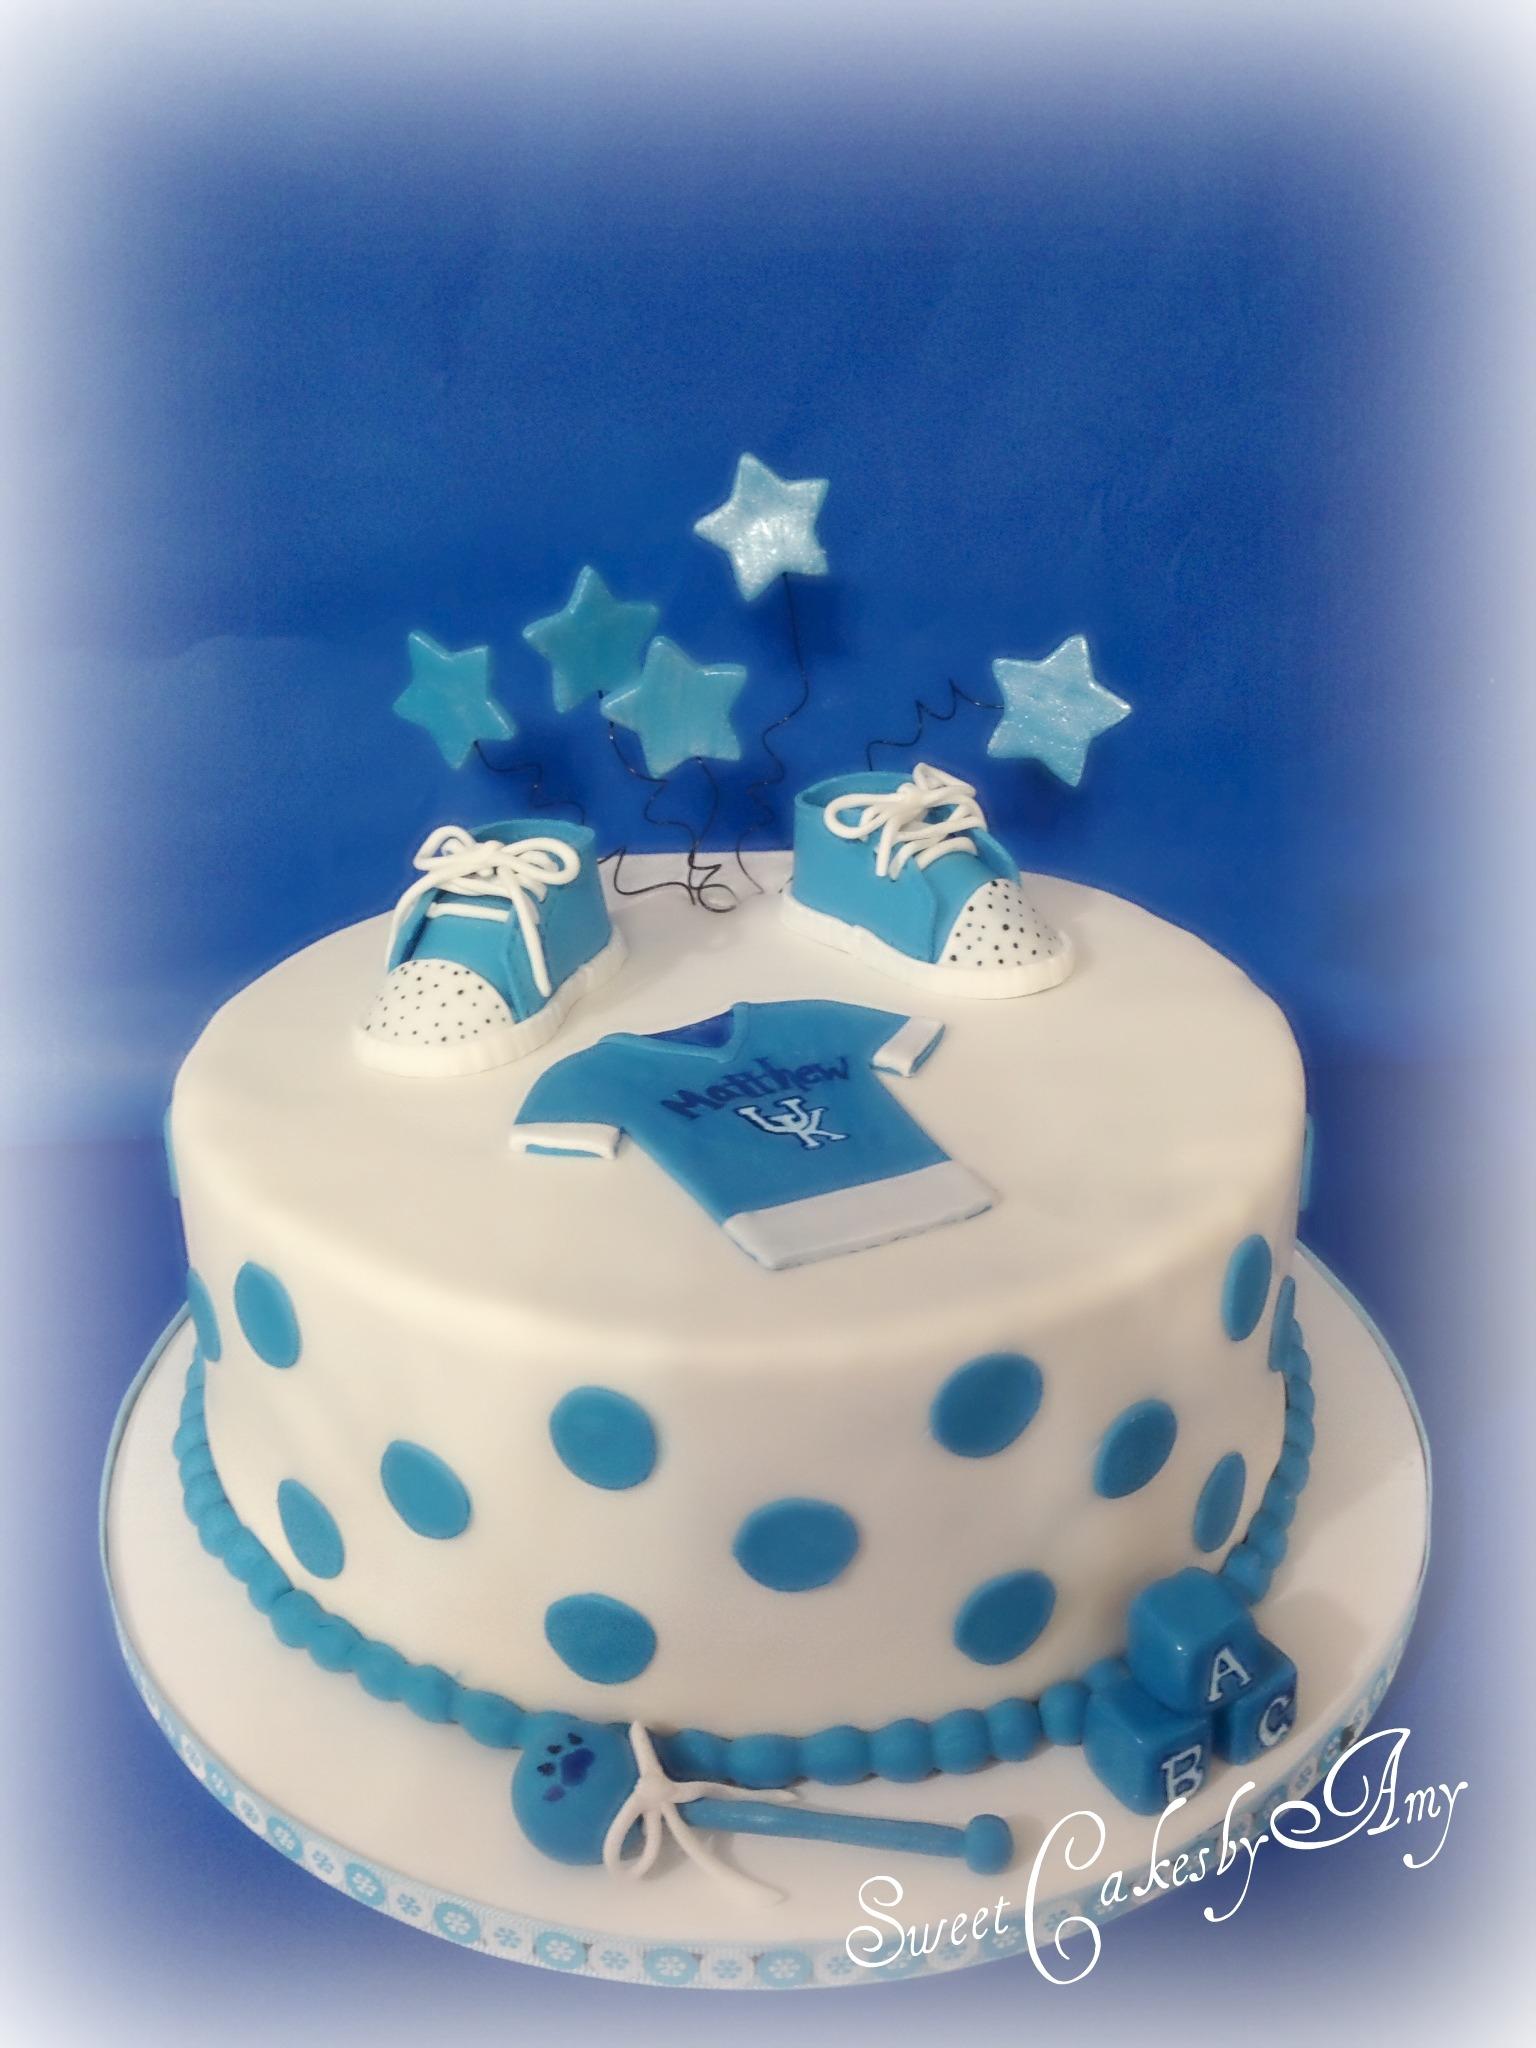 Baby Shower Cake Decorations Uk : Uk Baby Shower Cake - CakeCentral.com